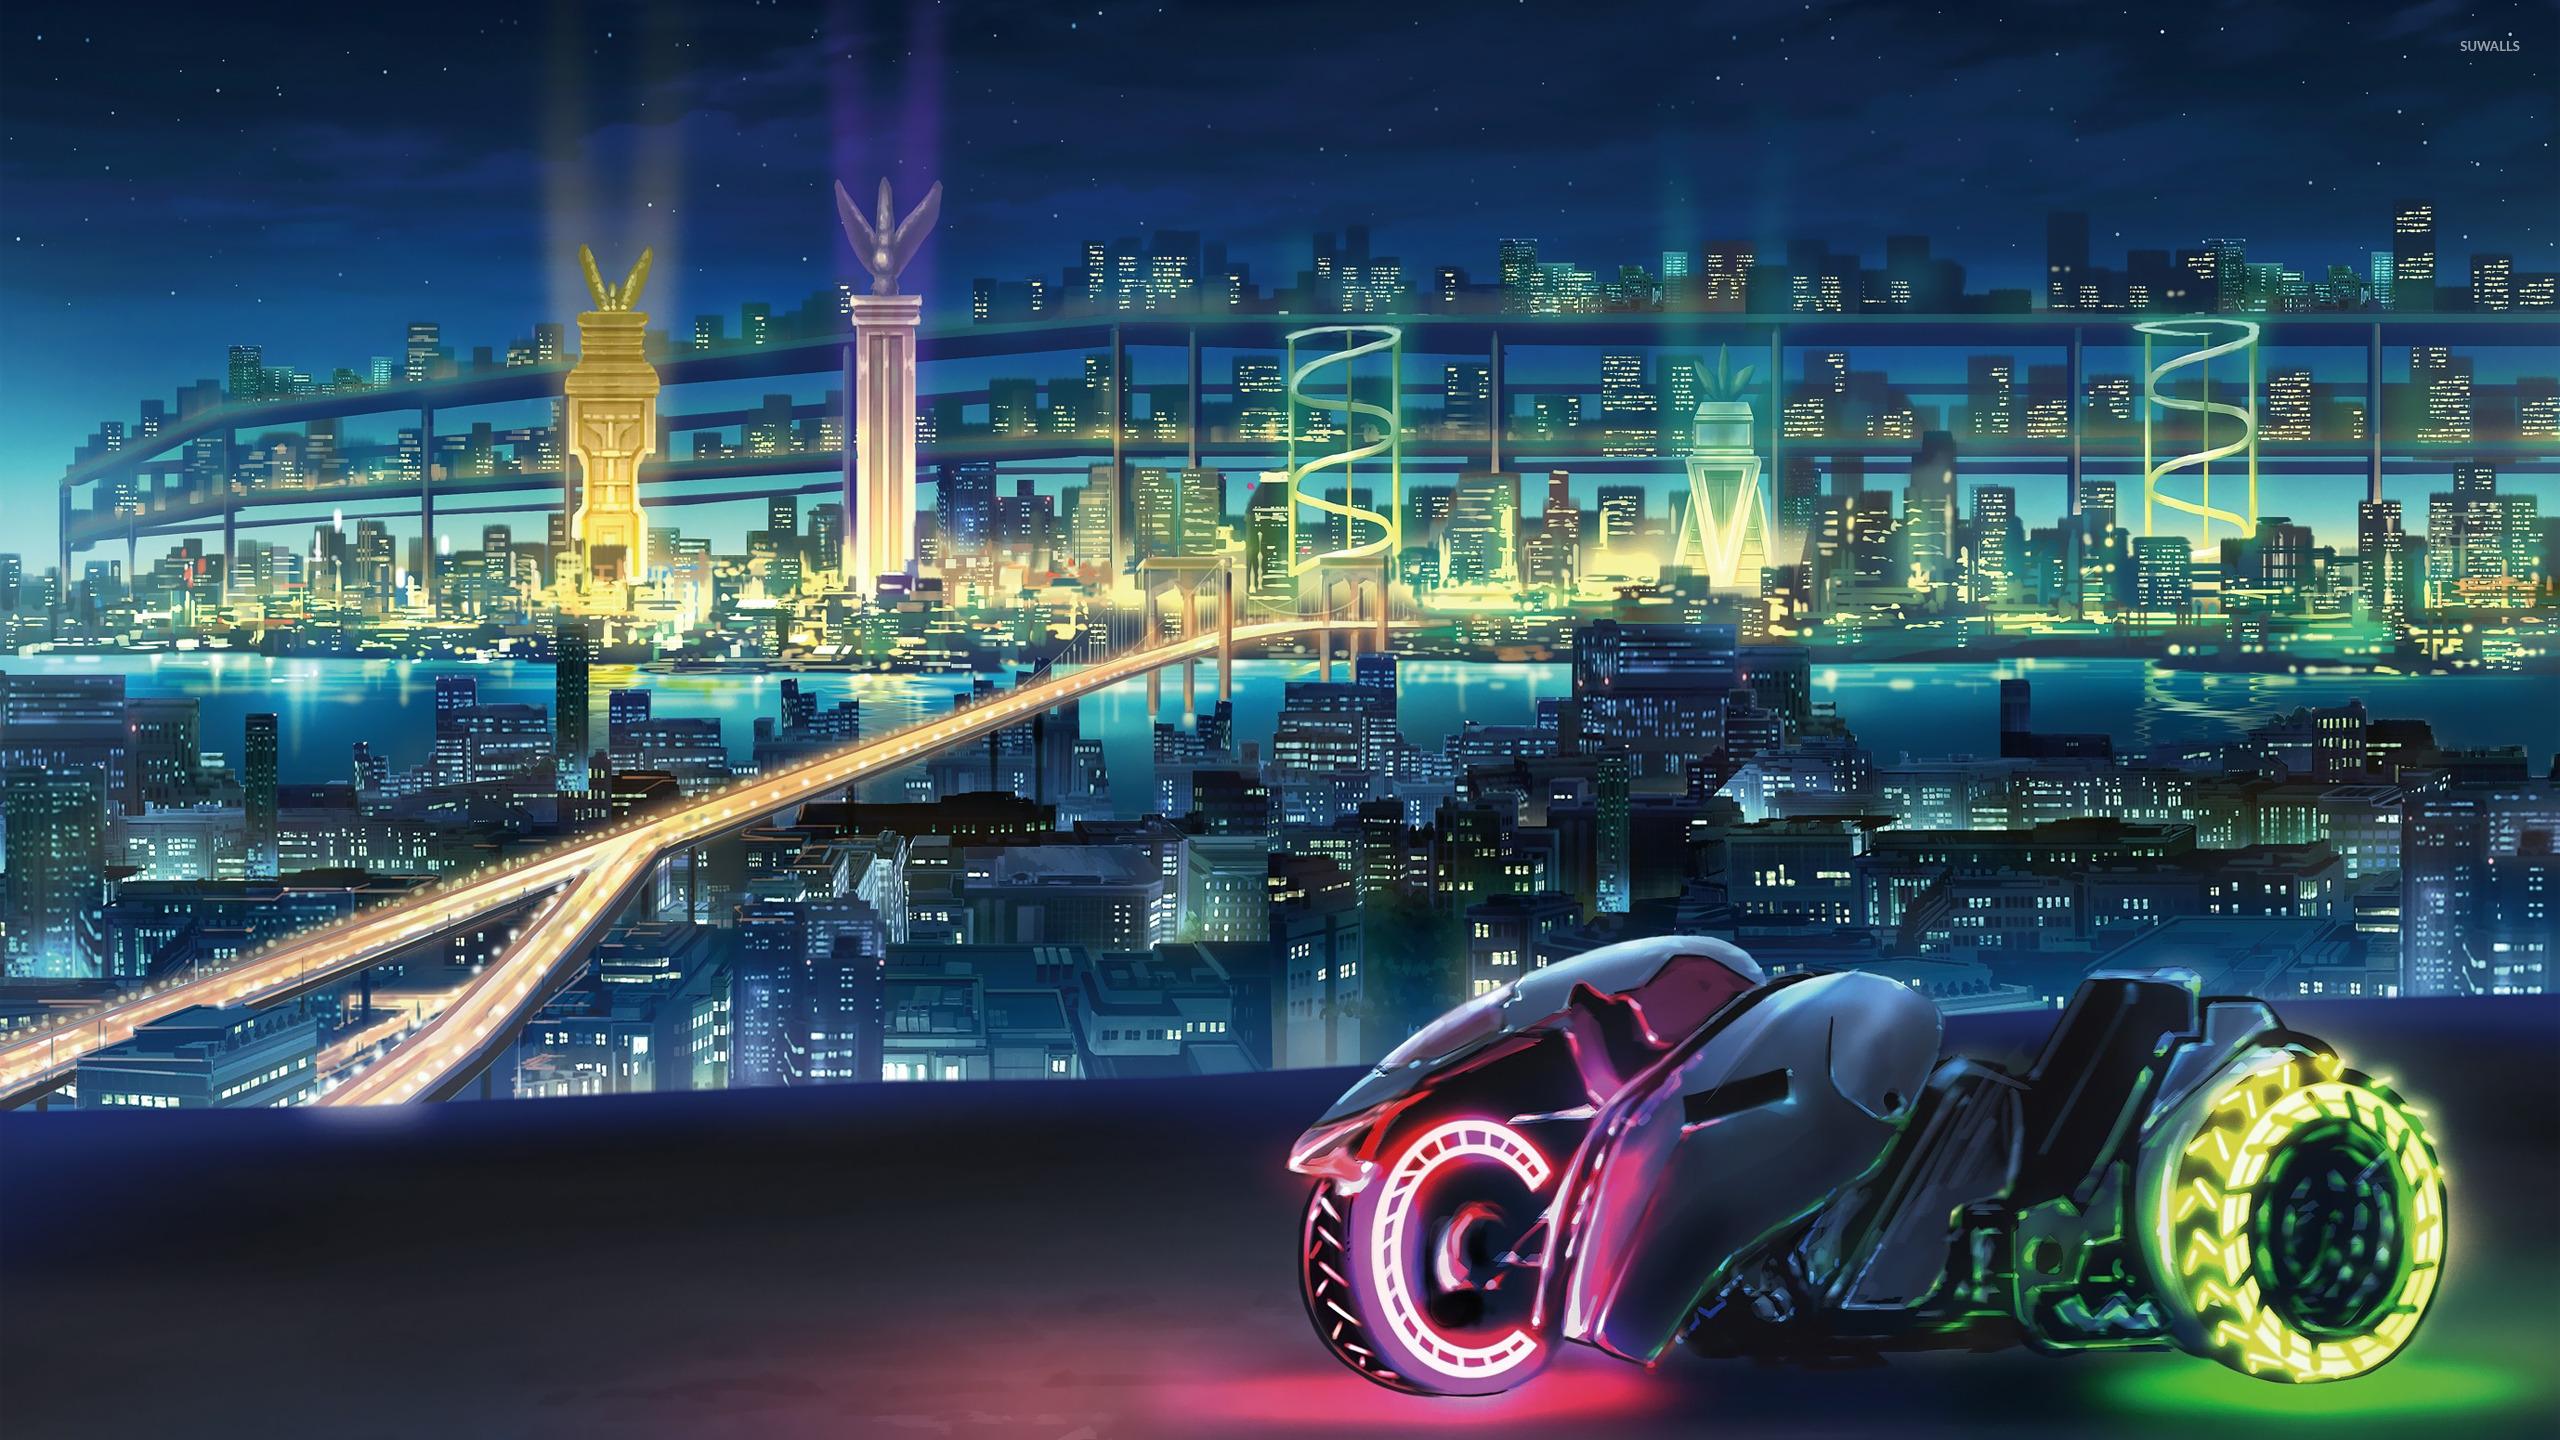 Sci Fi Neon City 2560x1440 Wallpaper Teahub Io